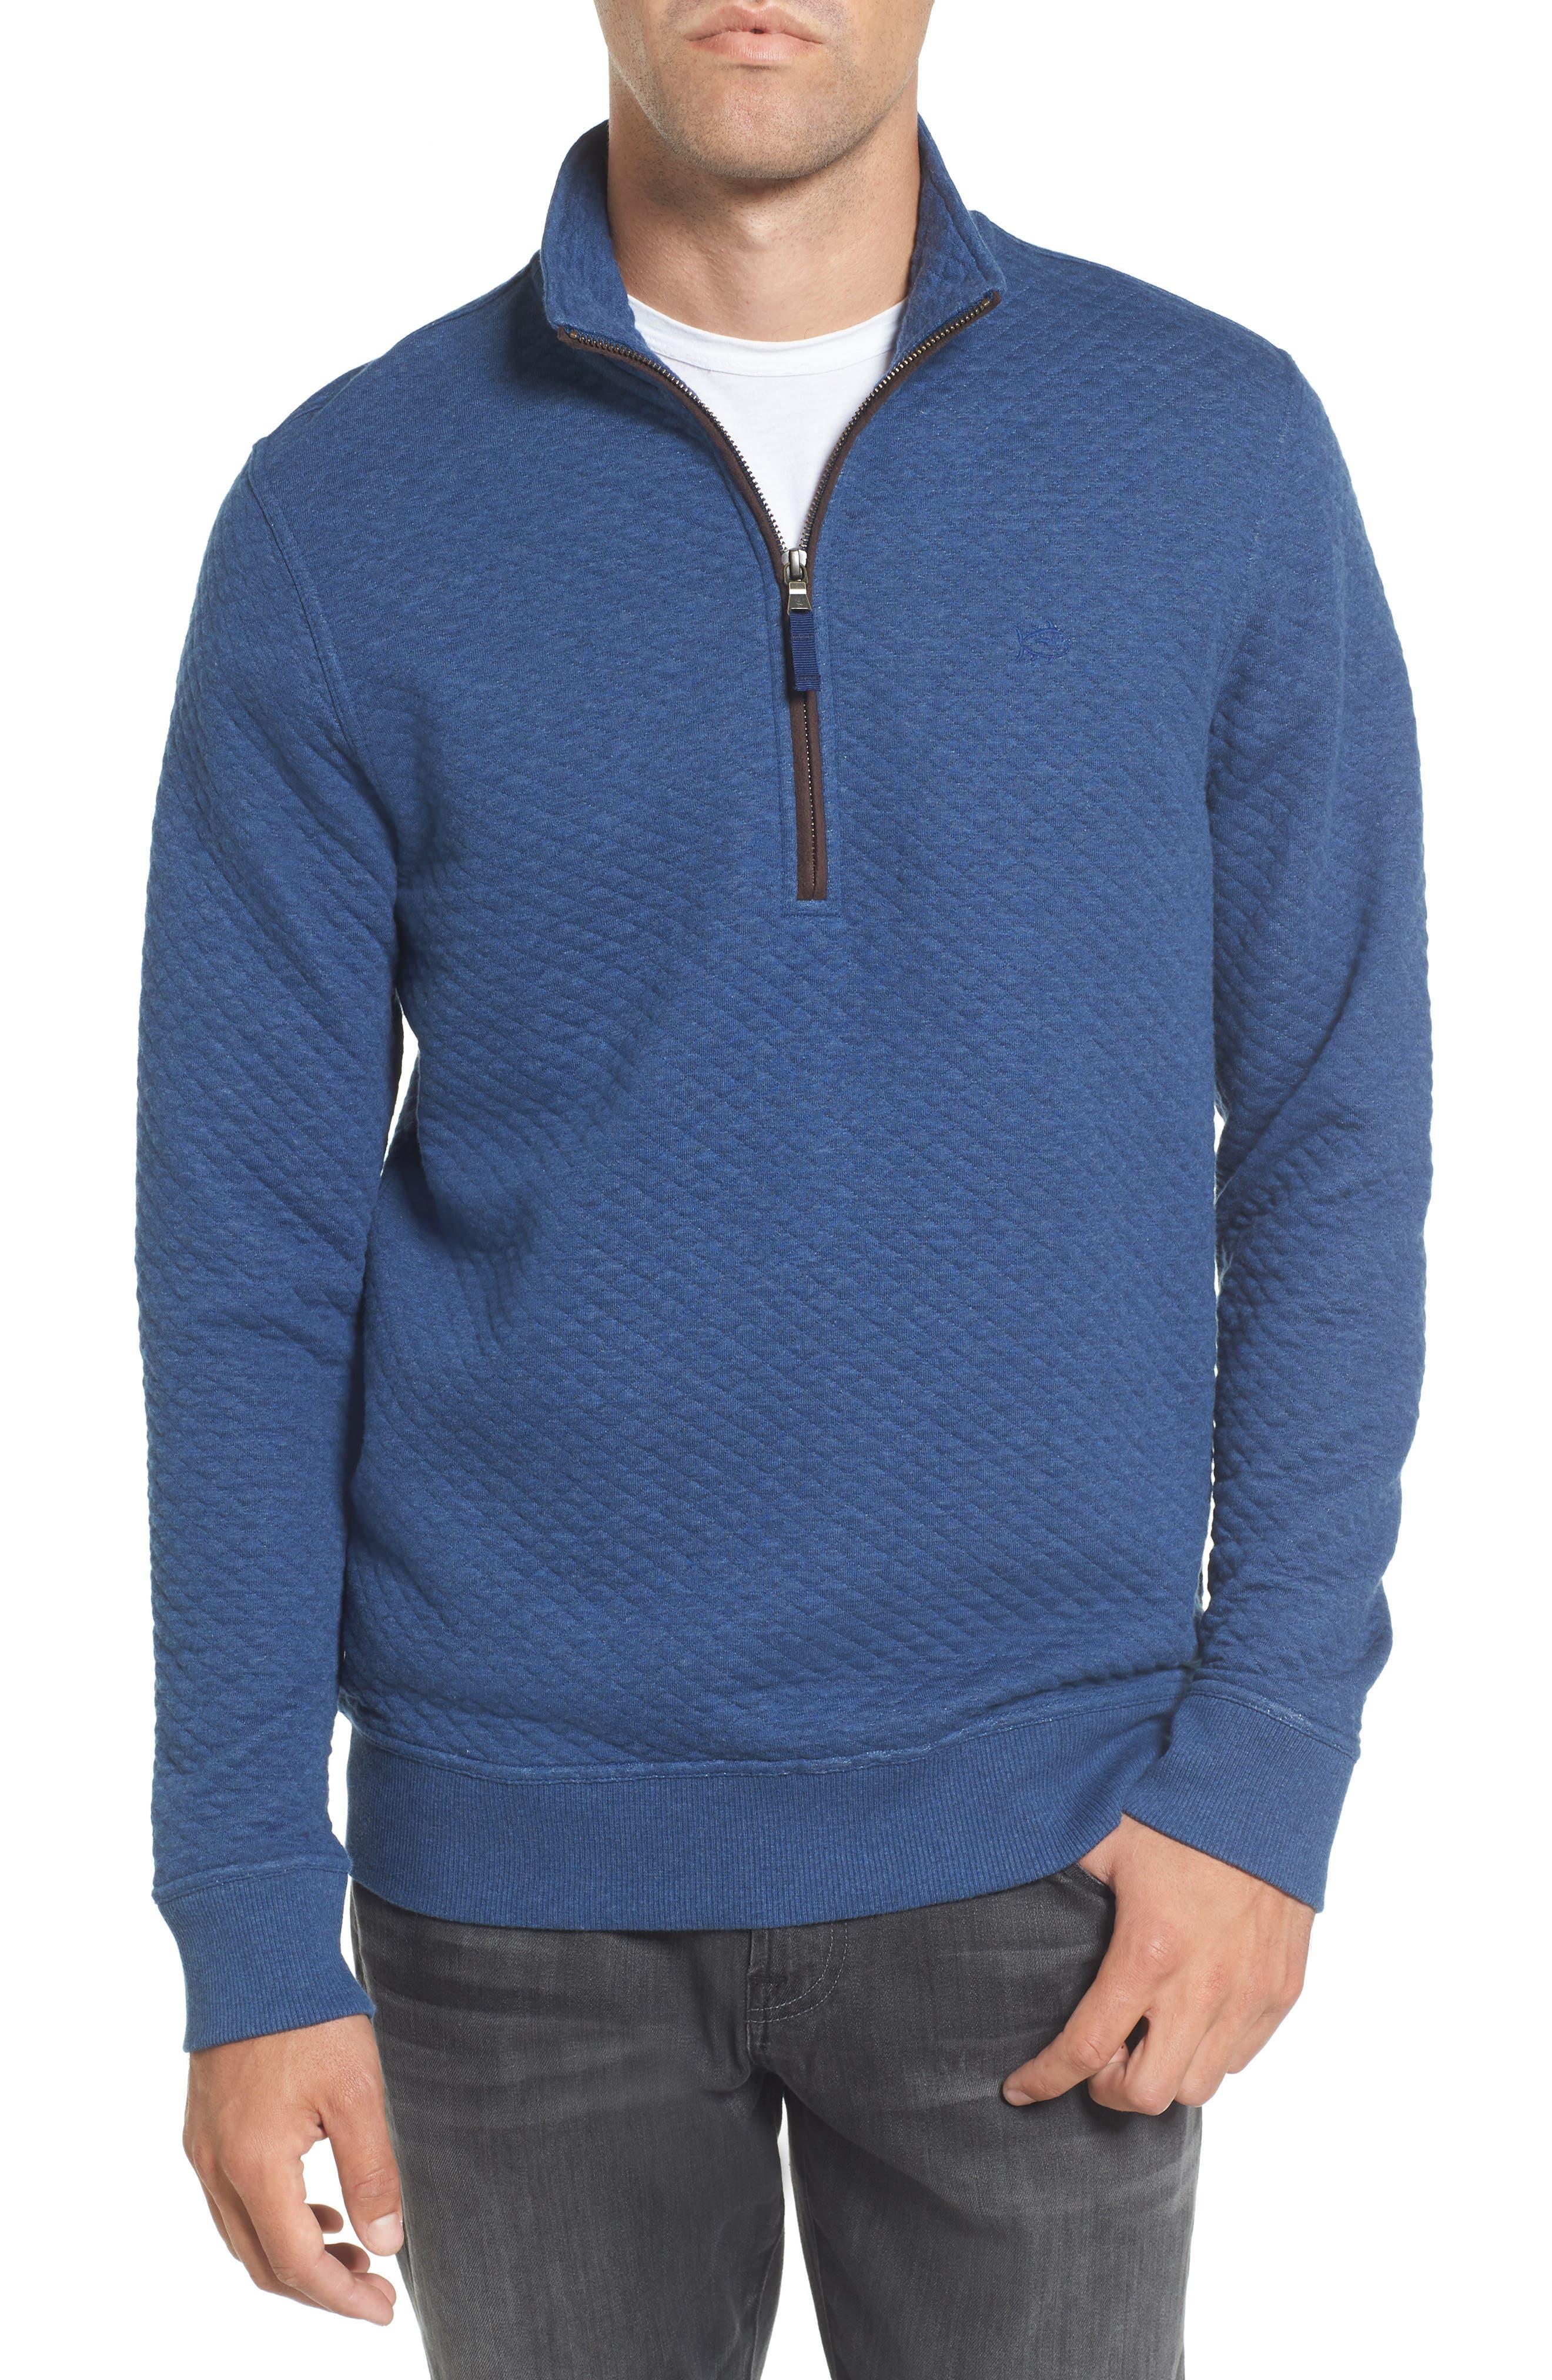 Sundown Quilted Quarter Zip Pullover,                             Main thumbnail 1, color,                             Skipper Blue